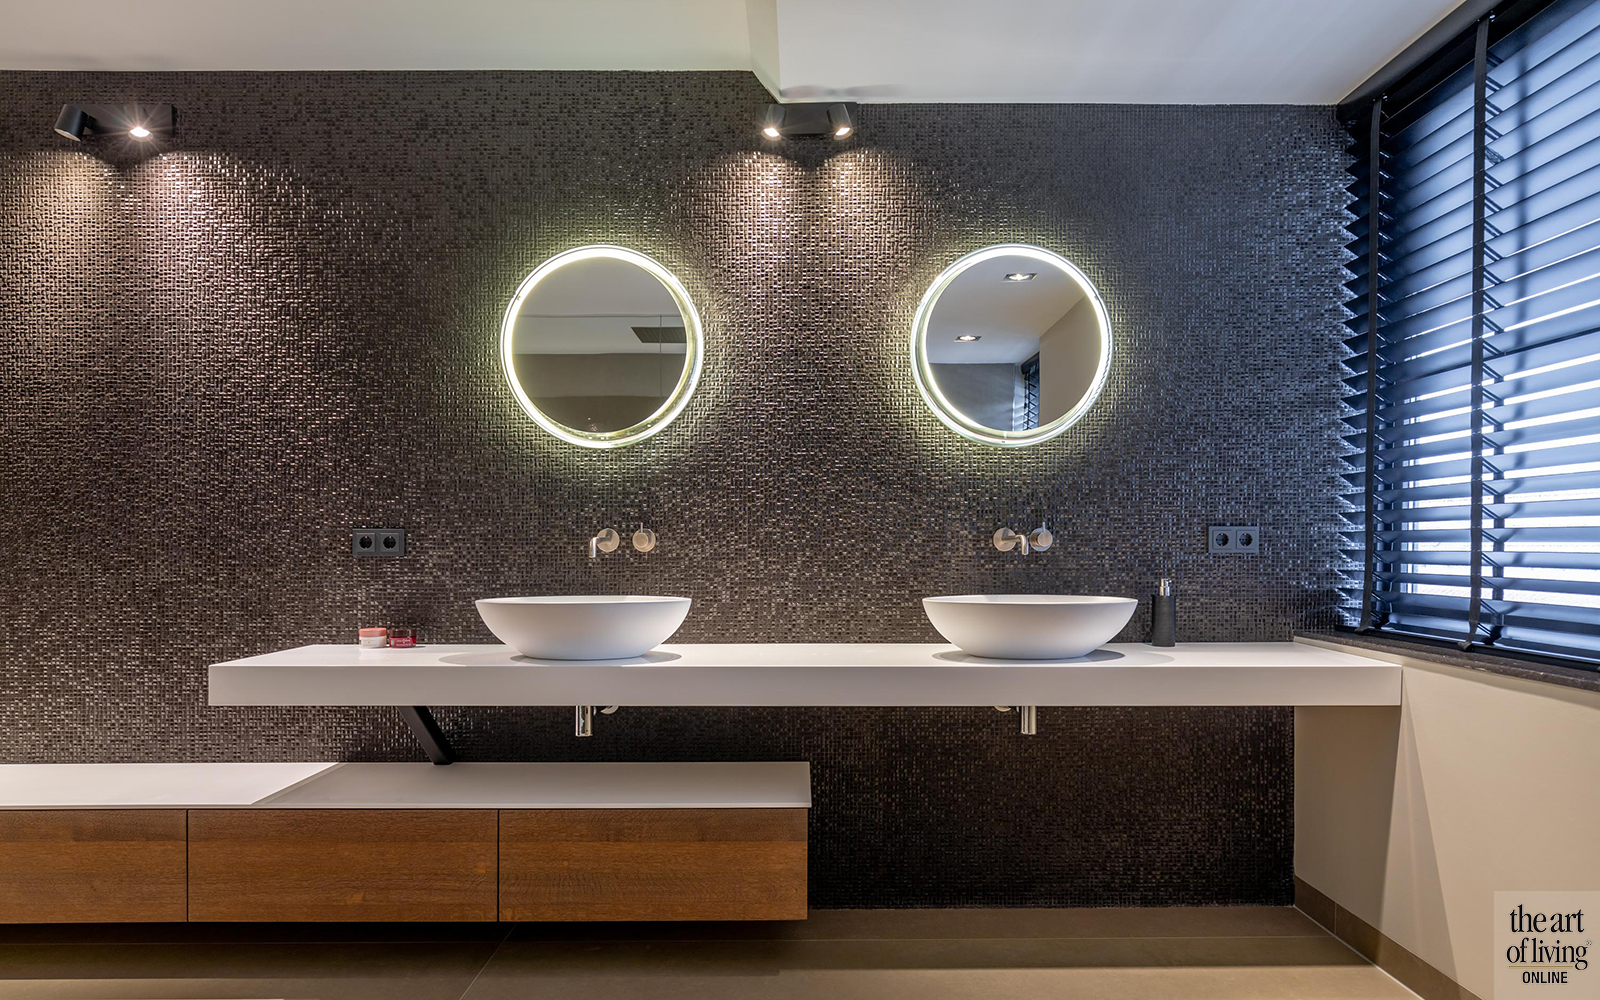 Spiegels, Badkamer spiegel, Spiegel, Ronde Spiegel, Vierkante spiegel, Kaptafel met spiegel, Spiegel met lamp, Rechthoekige spiegel